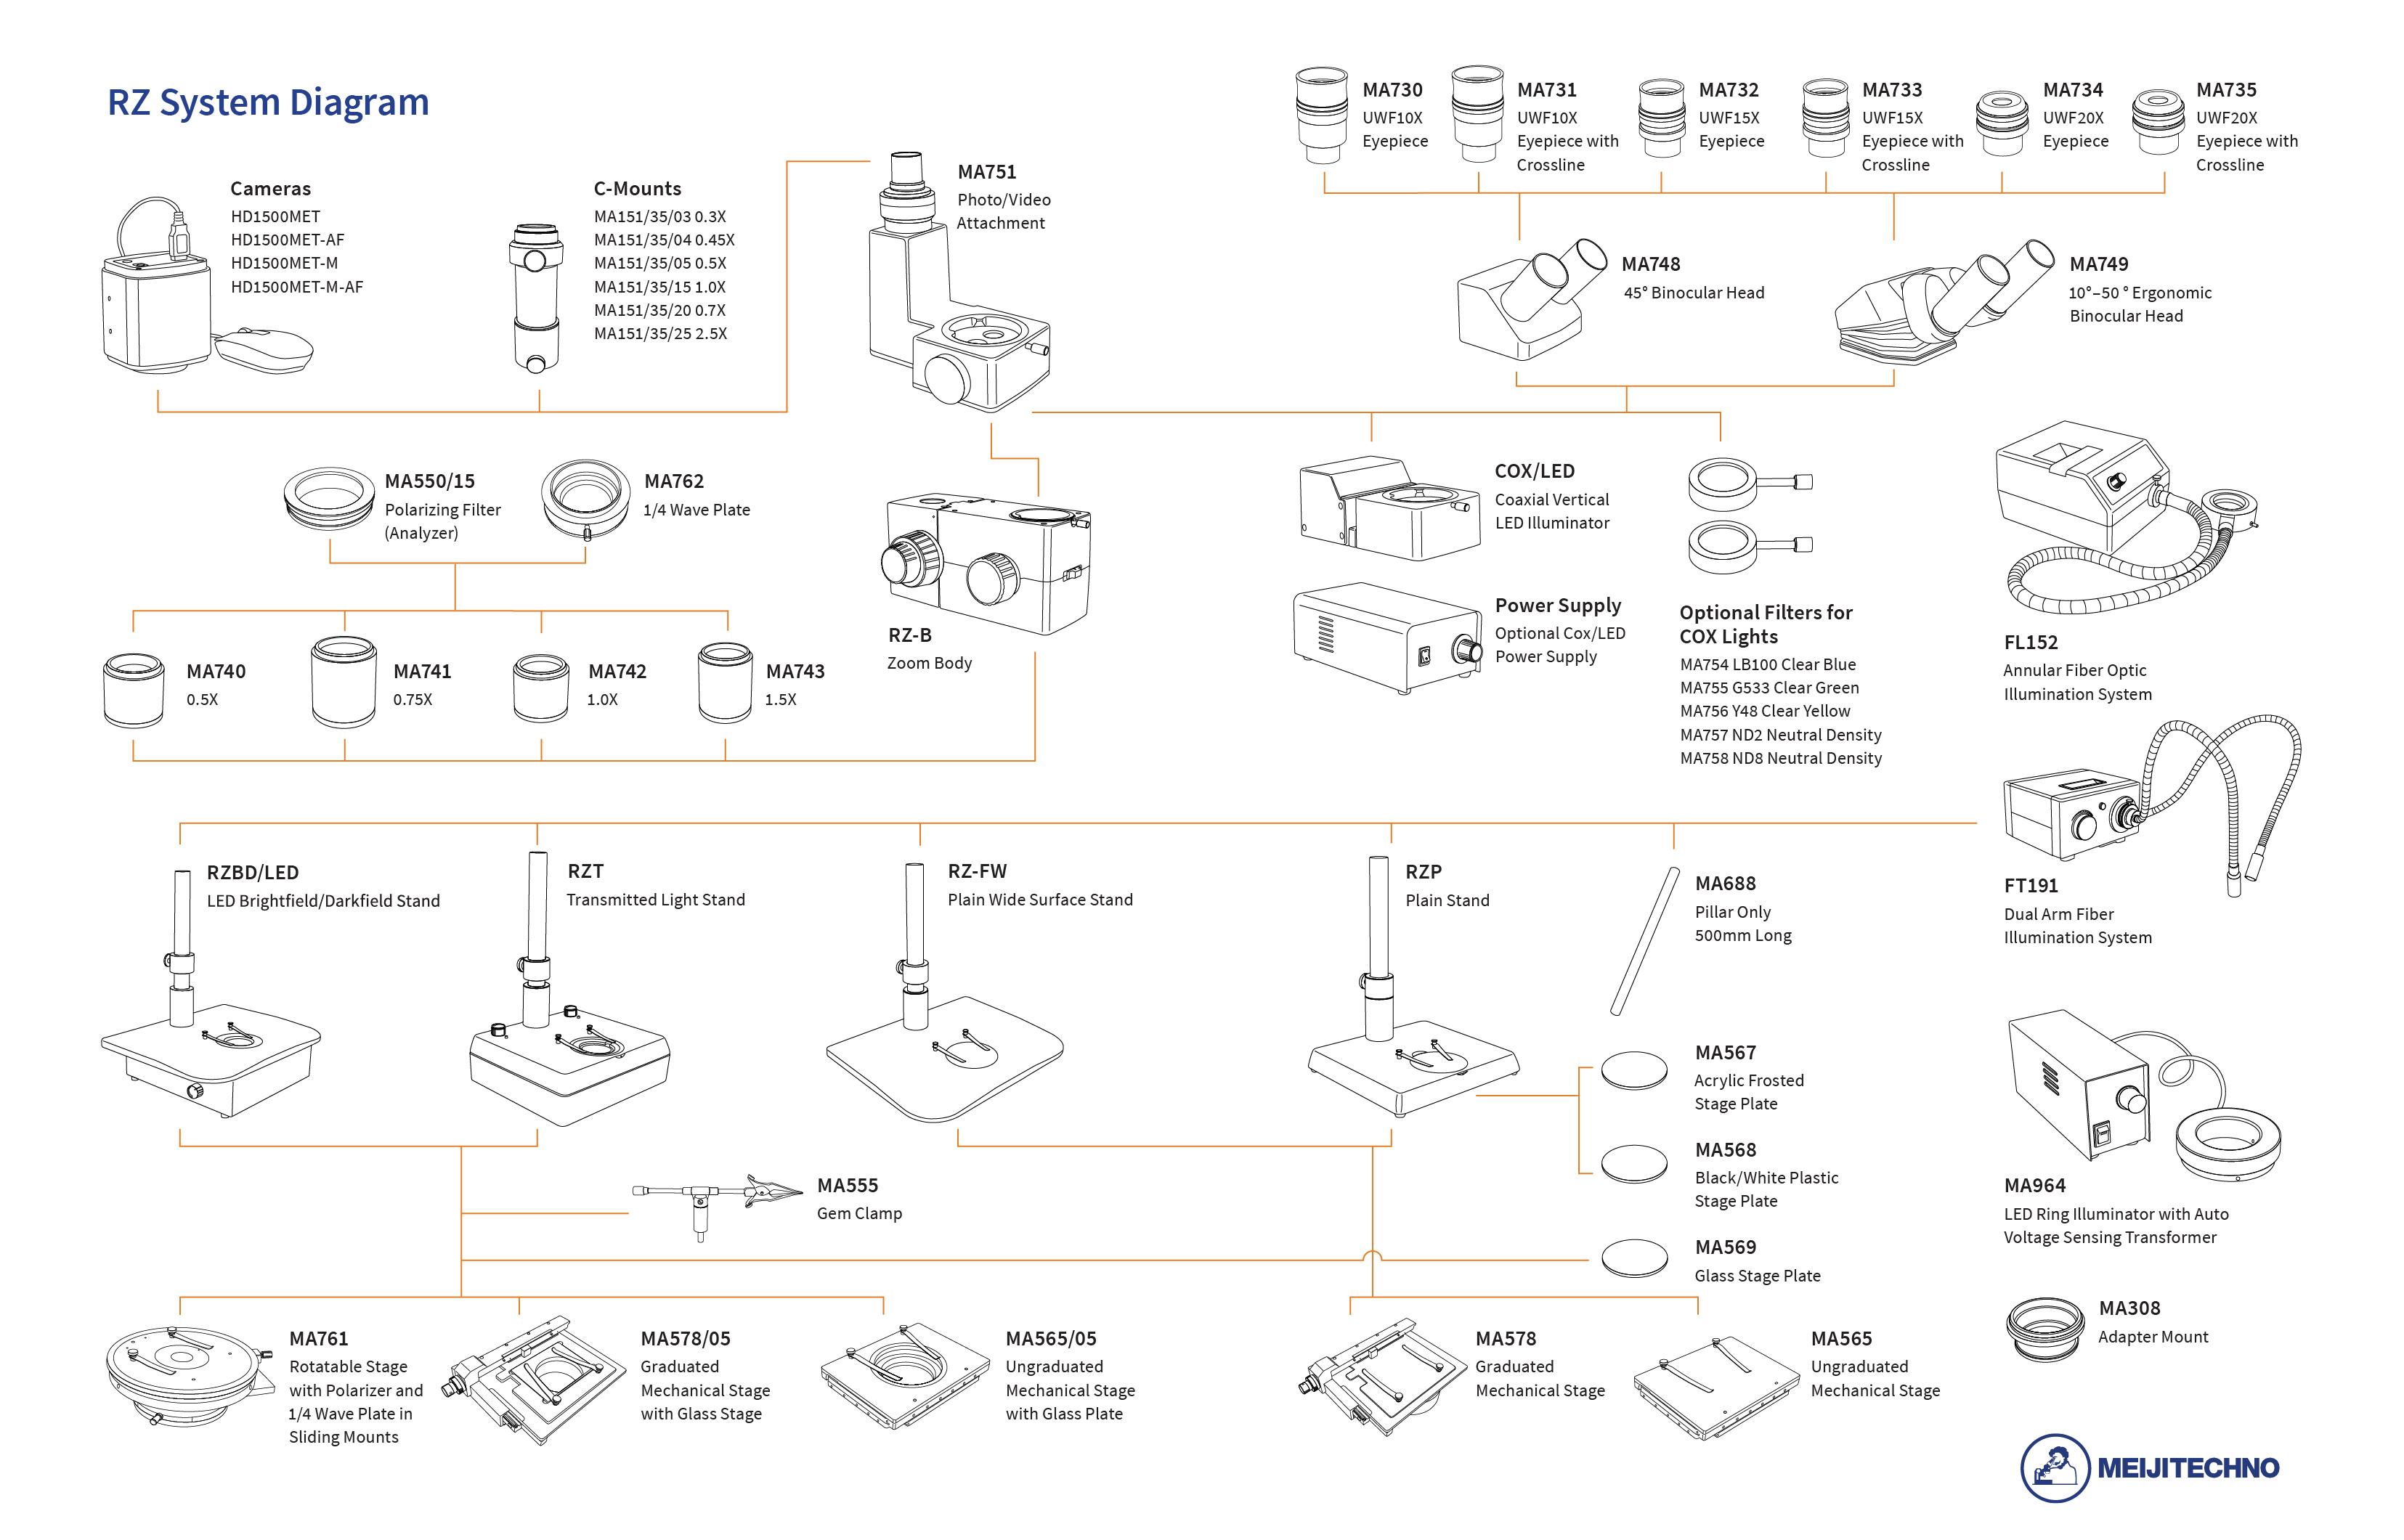 RZ System Diagram